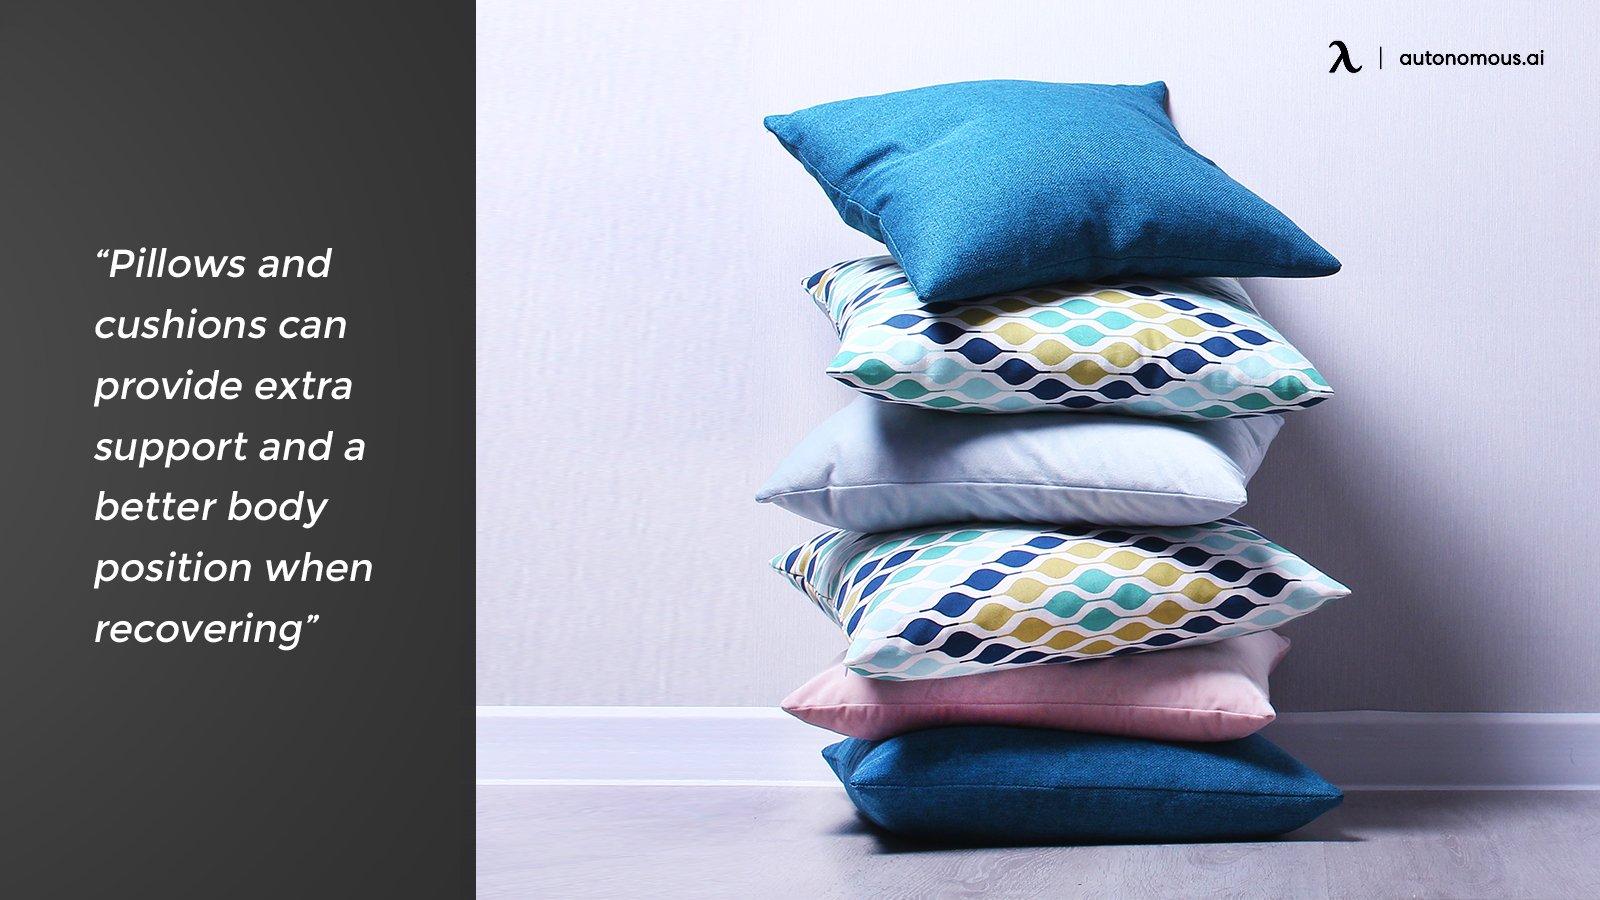 Pillows for body